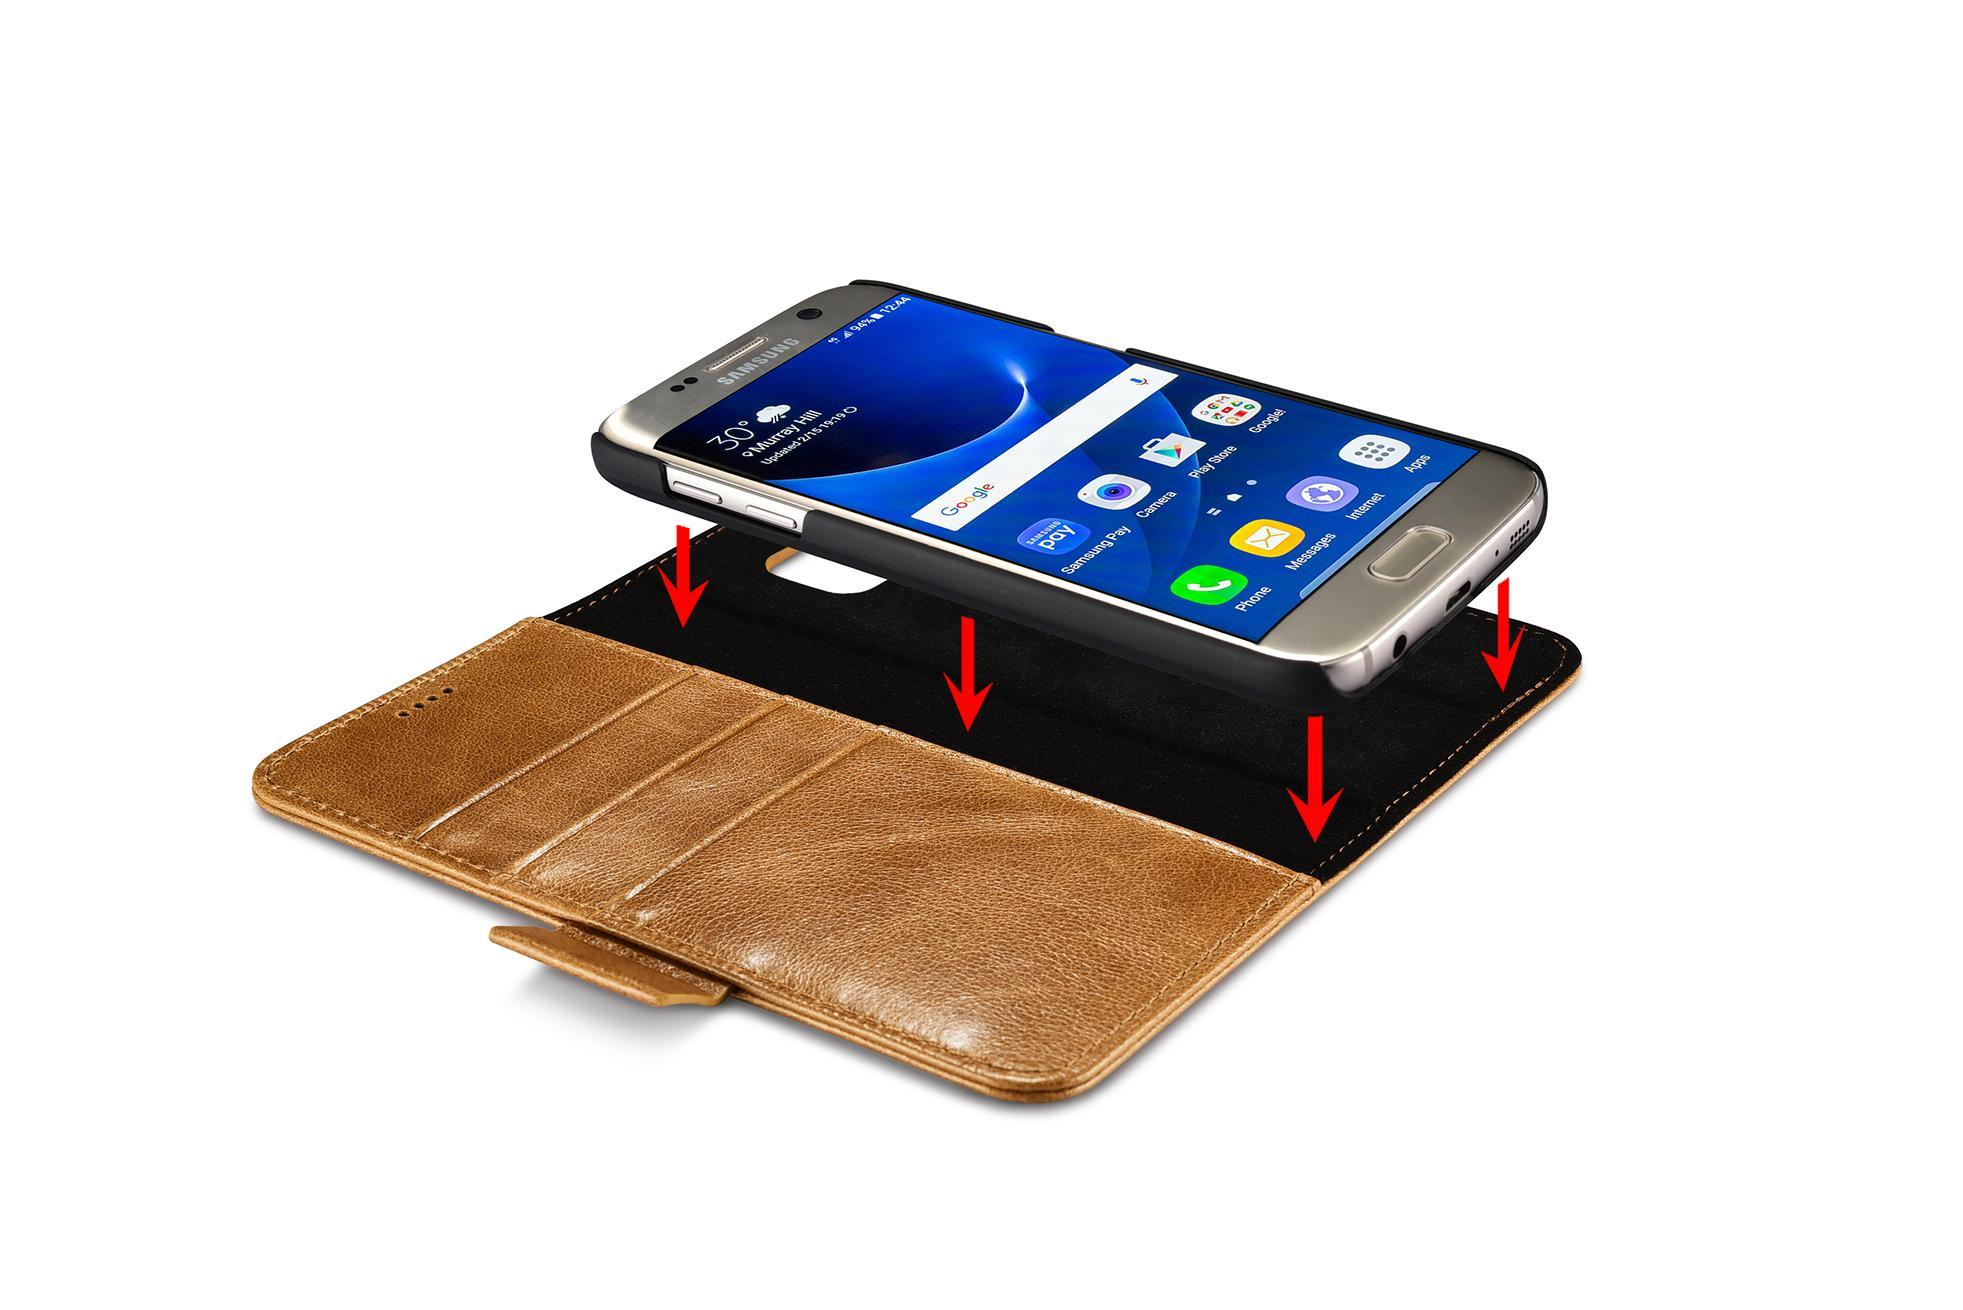 iCarer Samsung Galaxy S7 Silmarillion Leather Detachable 2in1 Wallet Folio Case 16